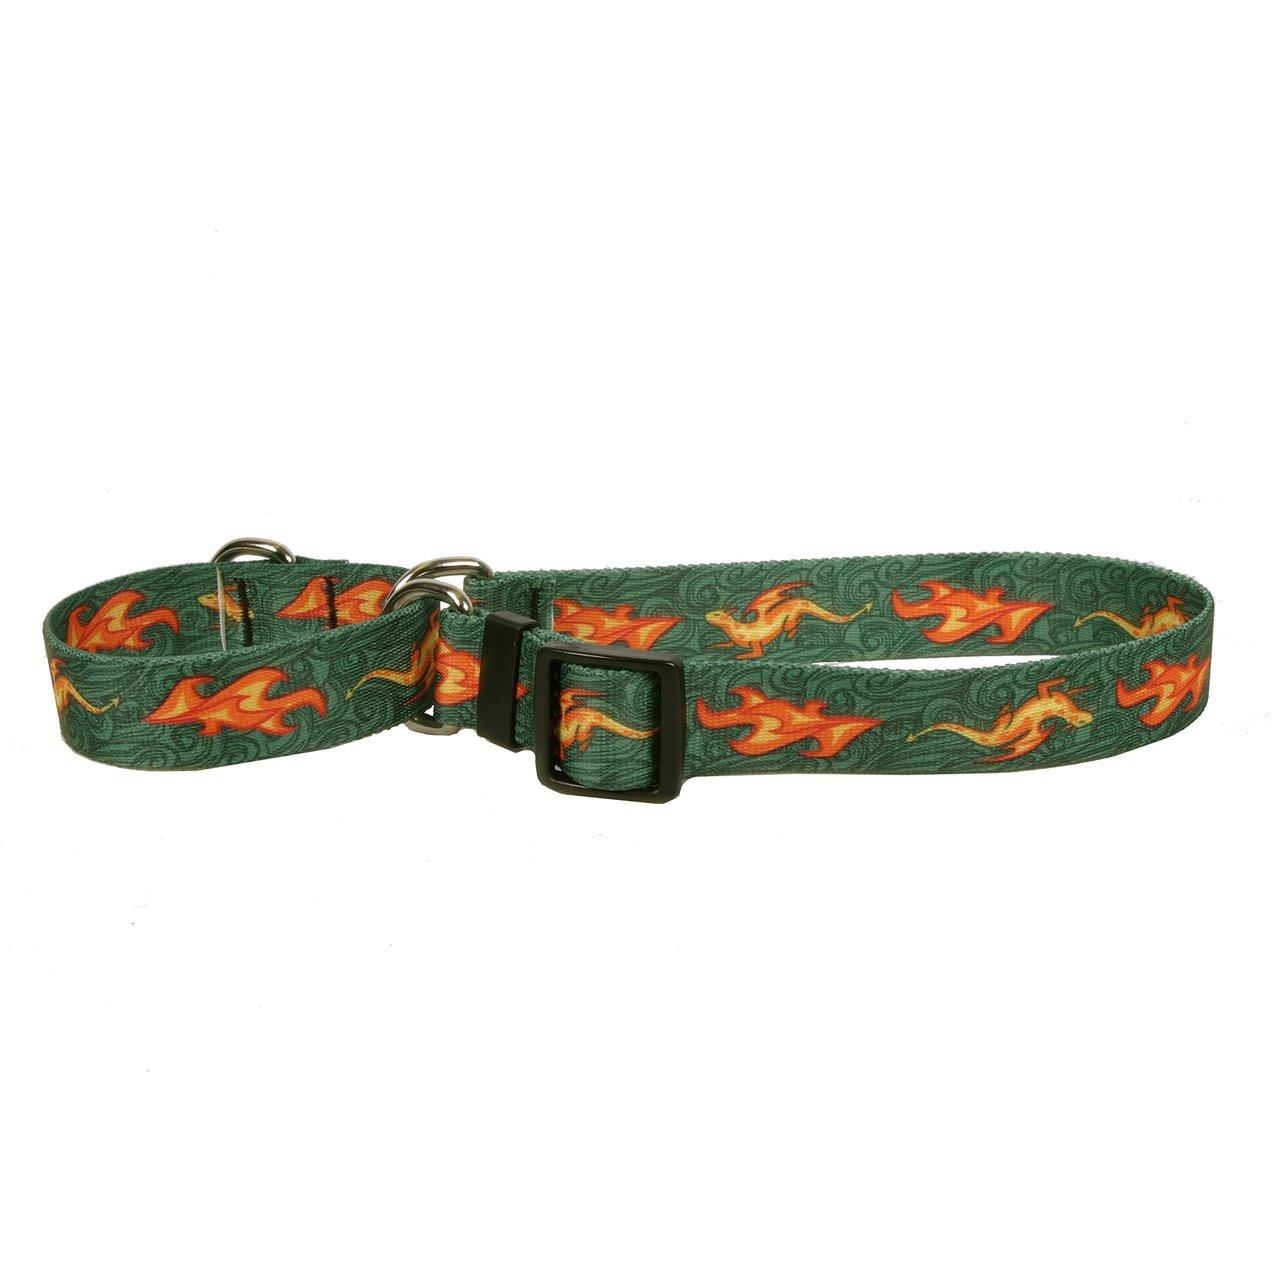 Yellow Dog Design Martingale Slip Collar, Fire Breathing Dragon, Medium 20''